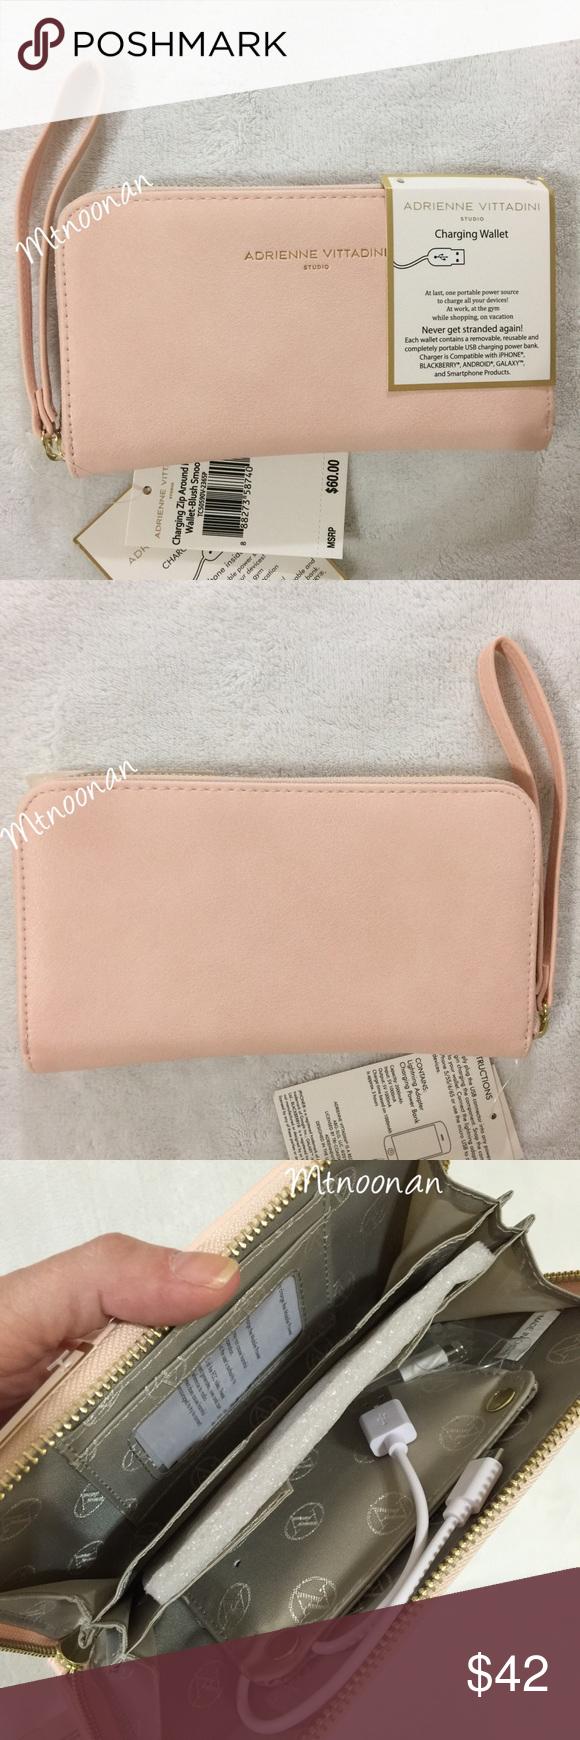 f7057d53292a72 Selling this Adrienne Vittadini Charging Zip Phone Wallet in my Poshmark  closet! My username is: mtnoonan. #shopmycloset #poshmark #fashion  #shopping #style ...